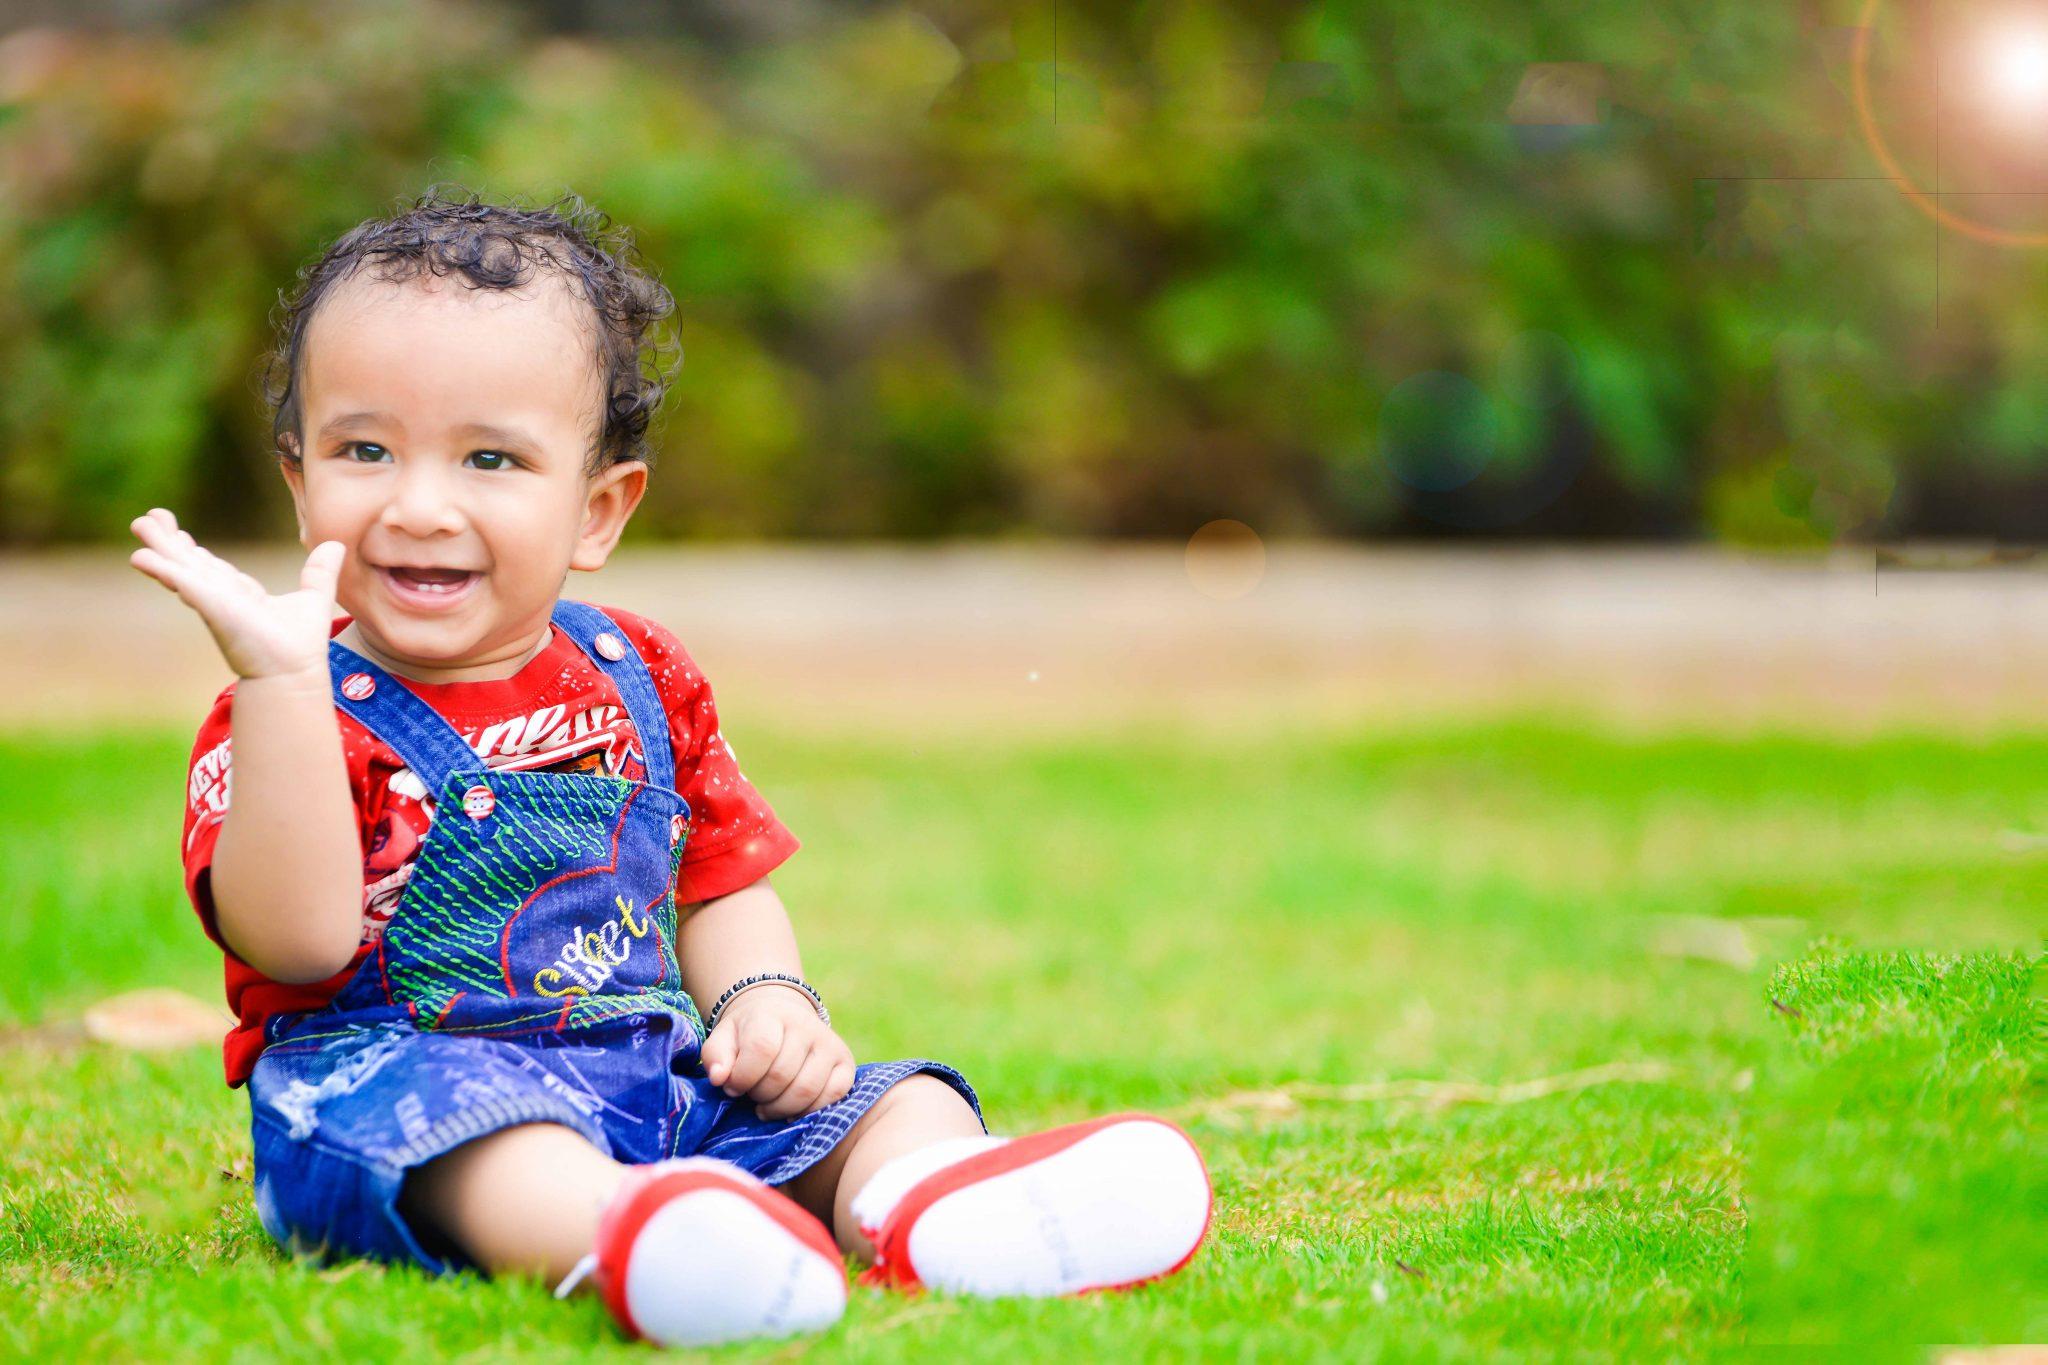 kids photoshoot kids photography baby boy photoshoot pre birthday photoshoot hyderabad